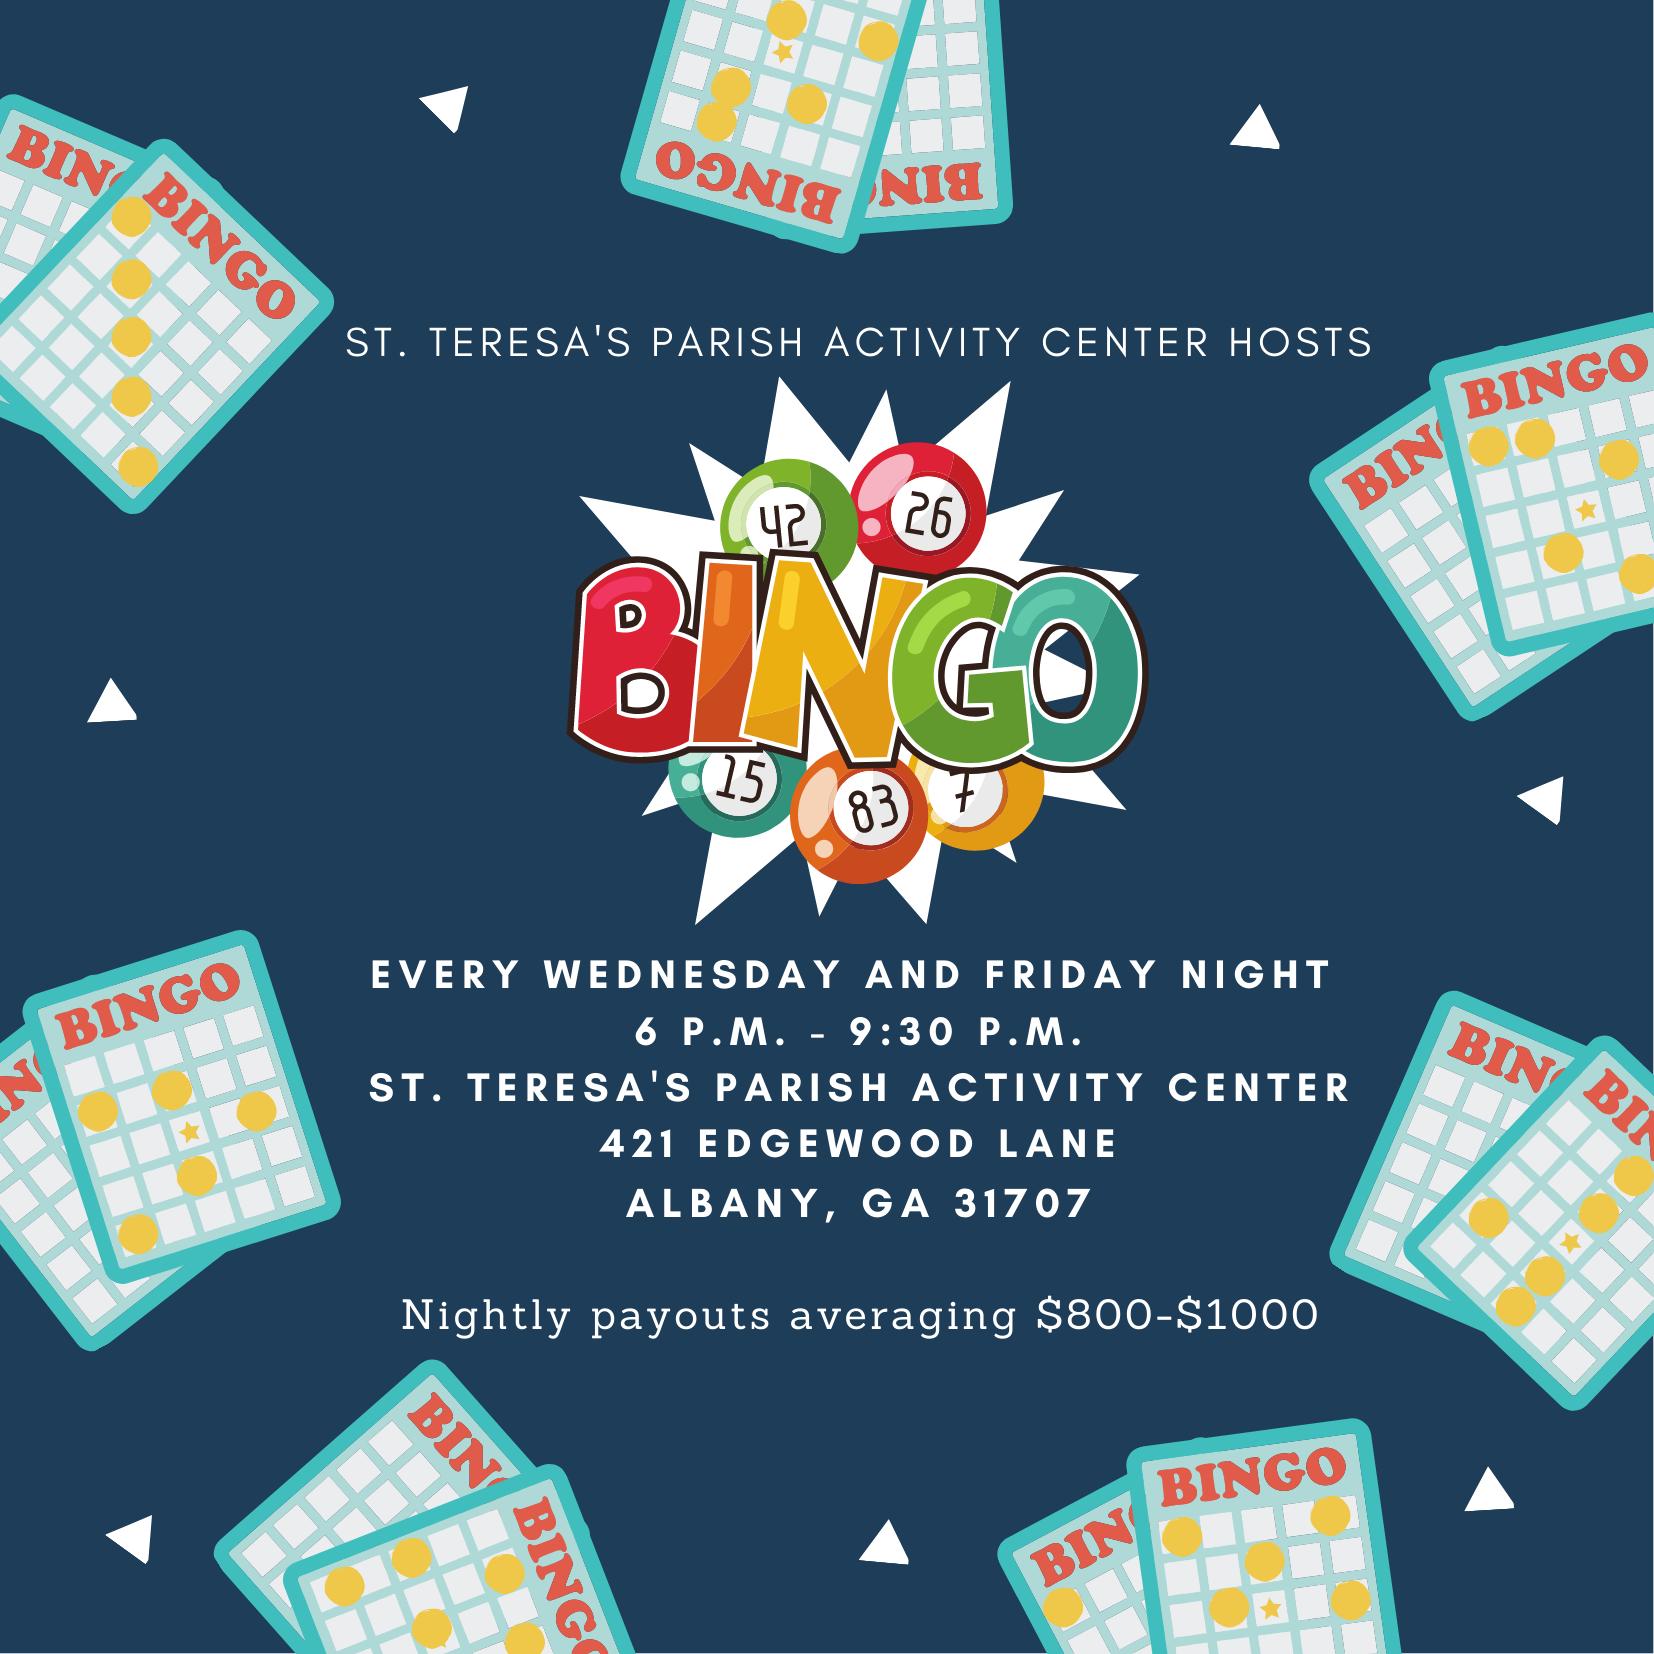 Bingo Night at St. Teresa's Parish